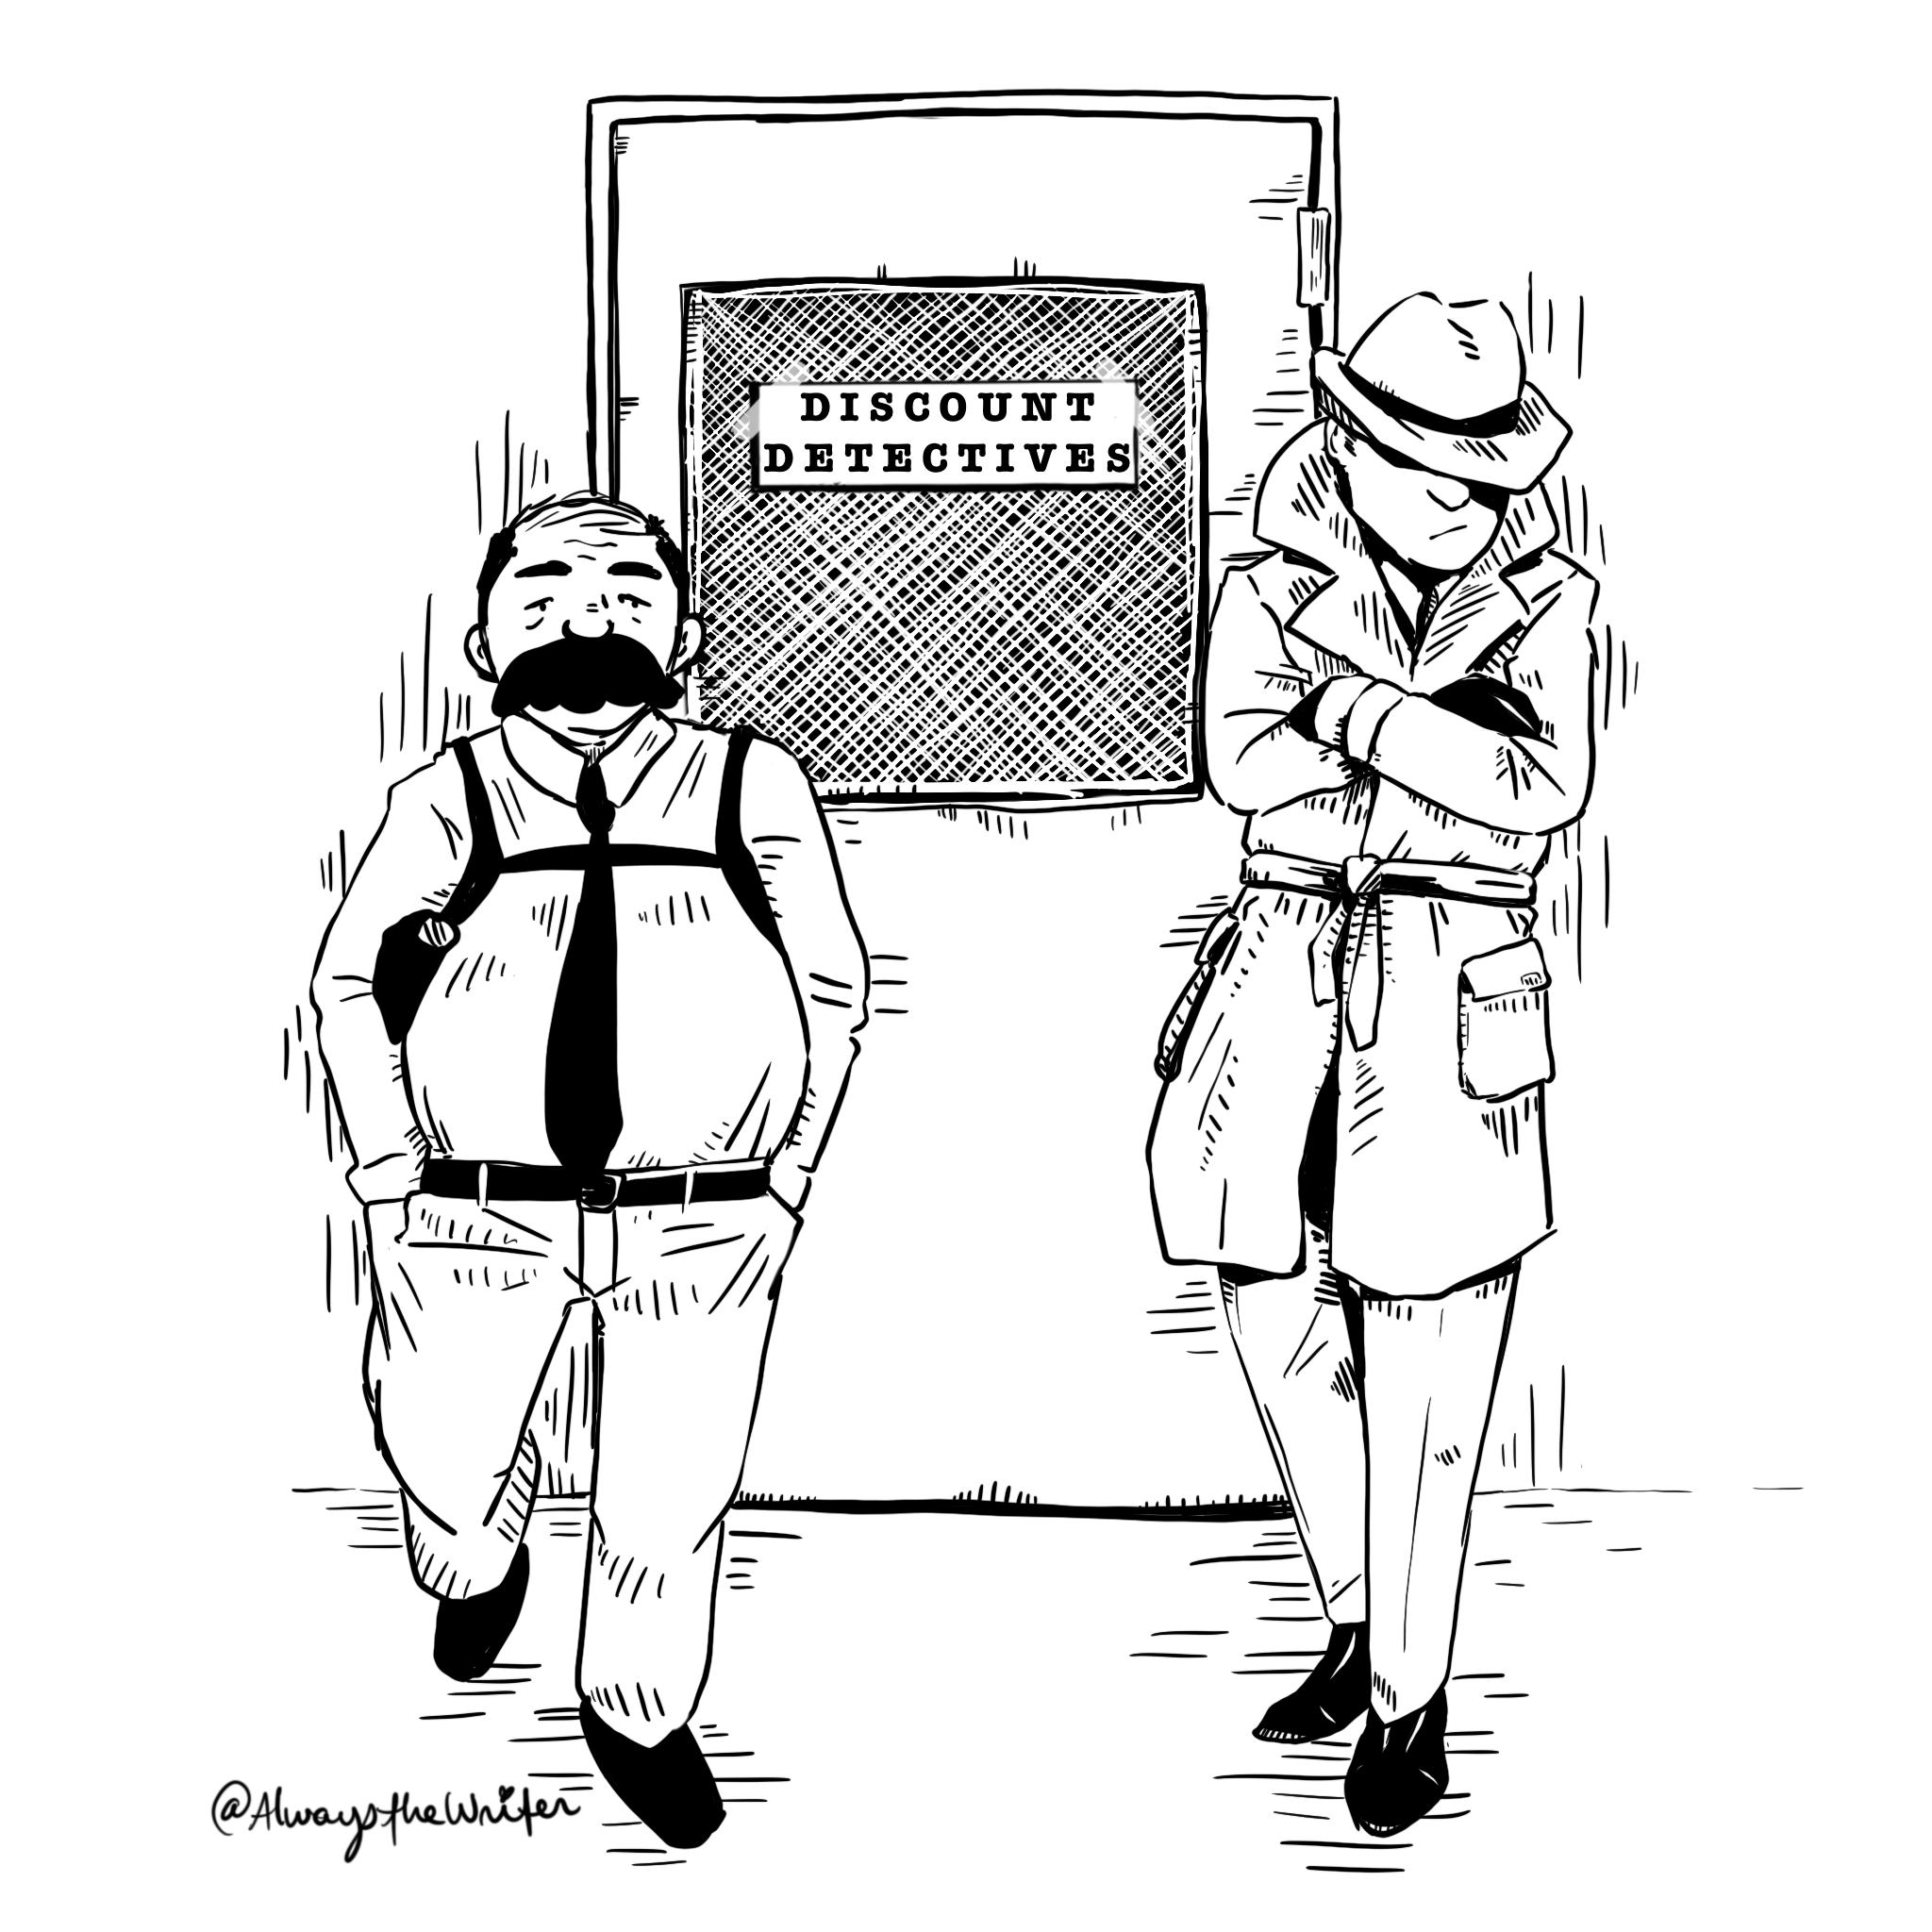 Discount Detectives concept